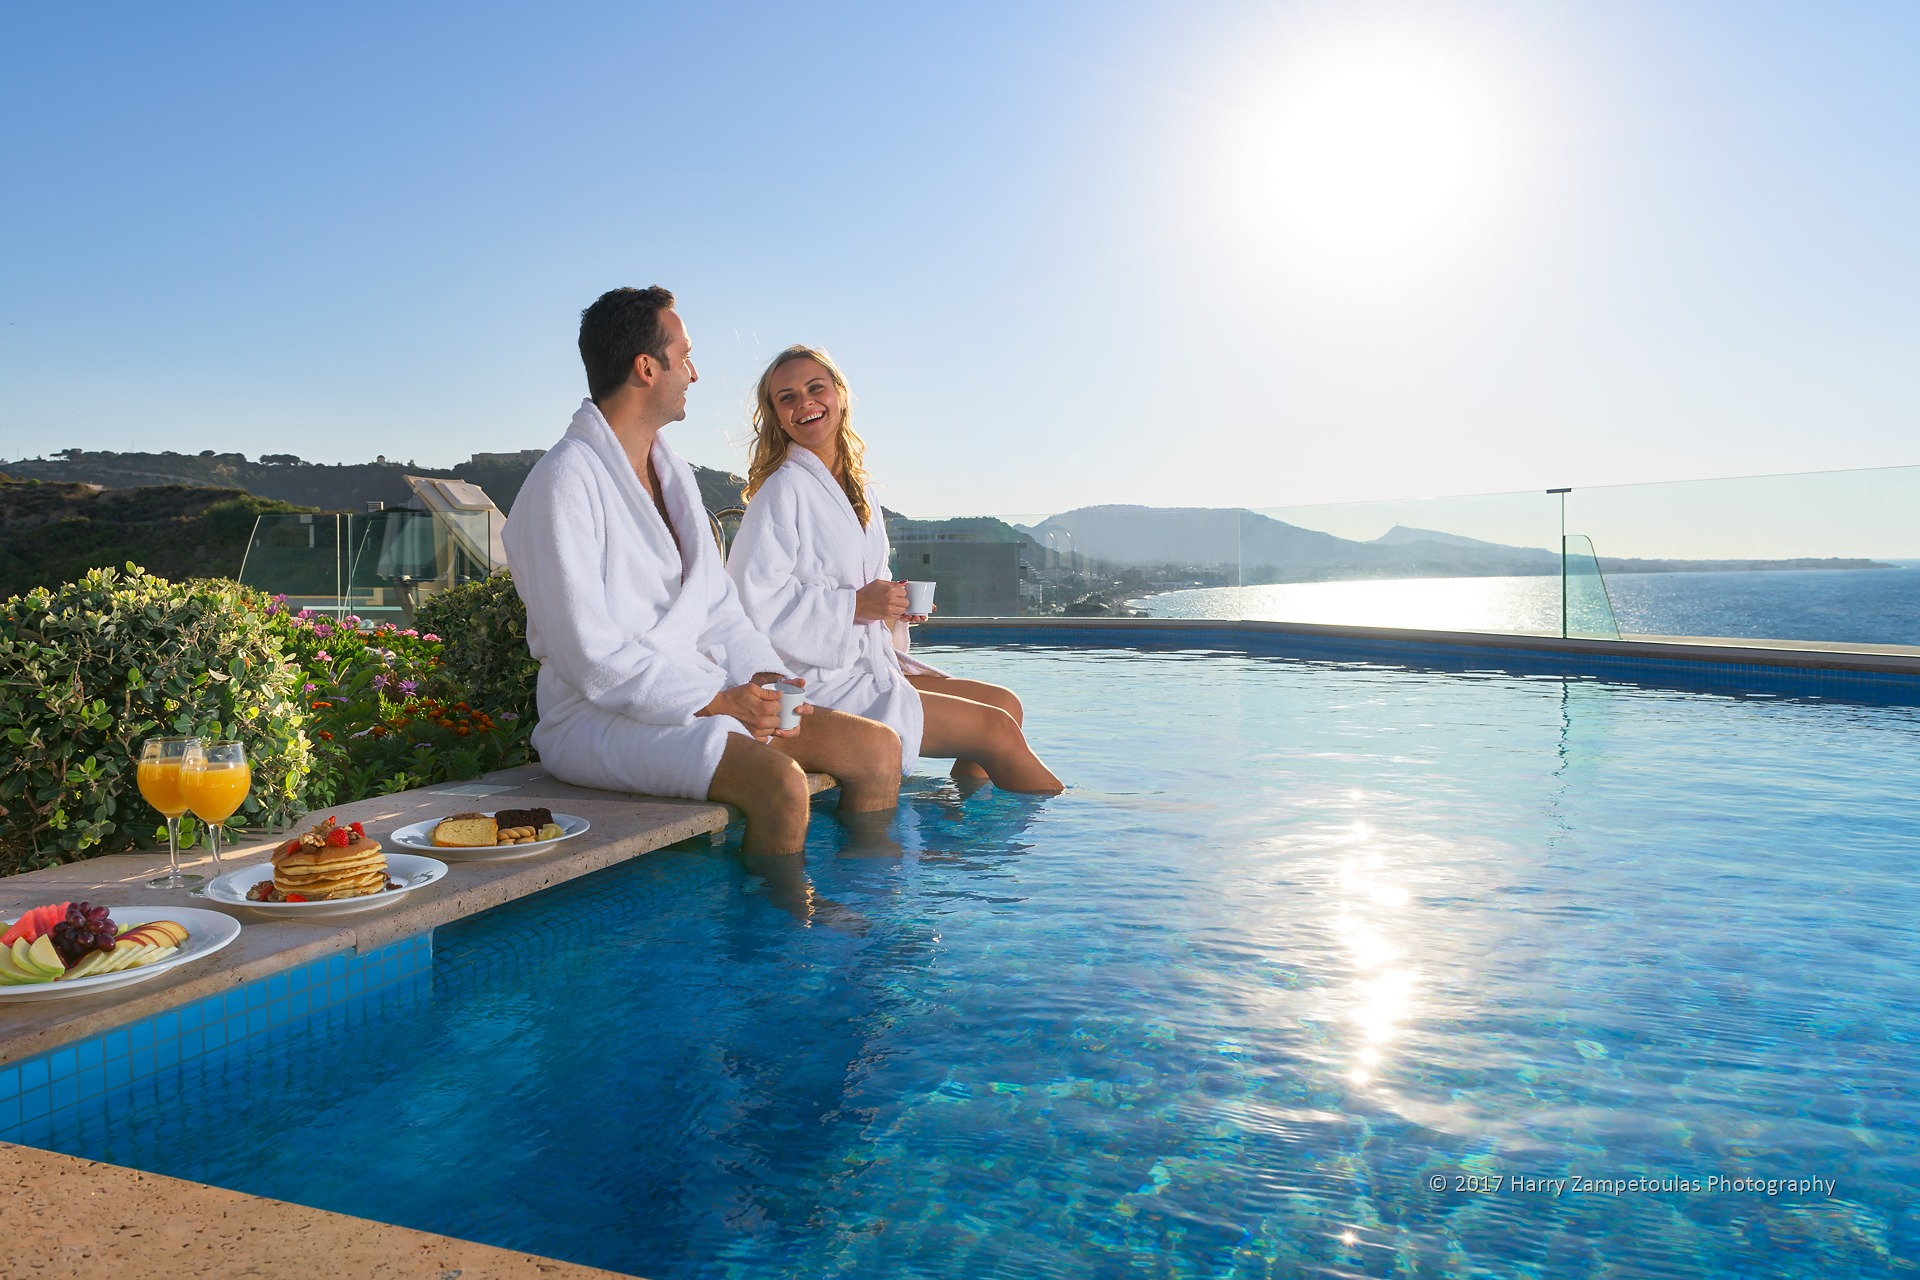 Atrium Platinum Luxury Hotel in Ixia Bay, Rhodes - Presidential-2a